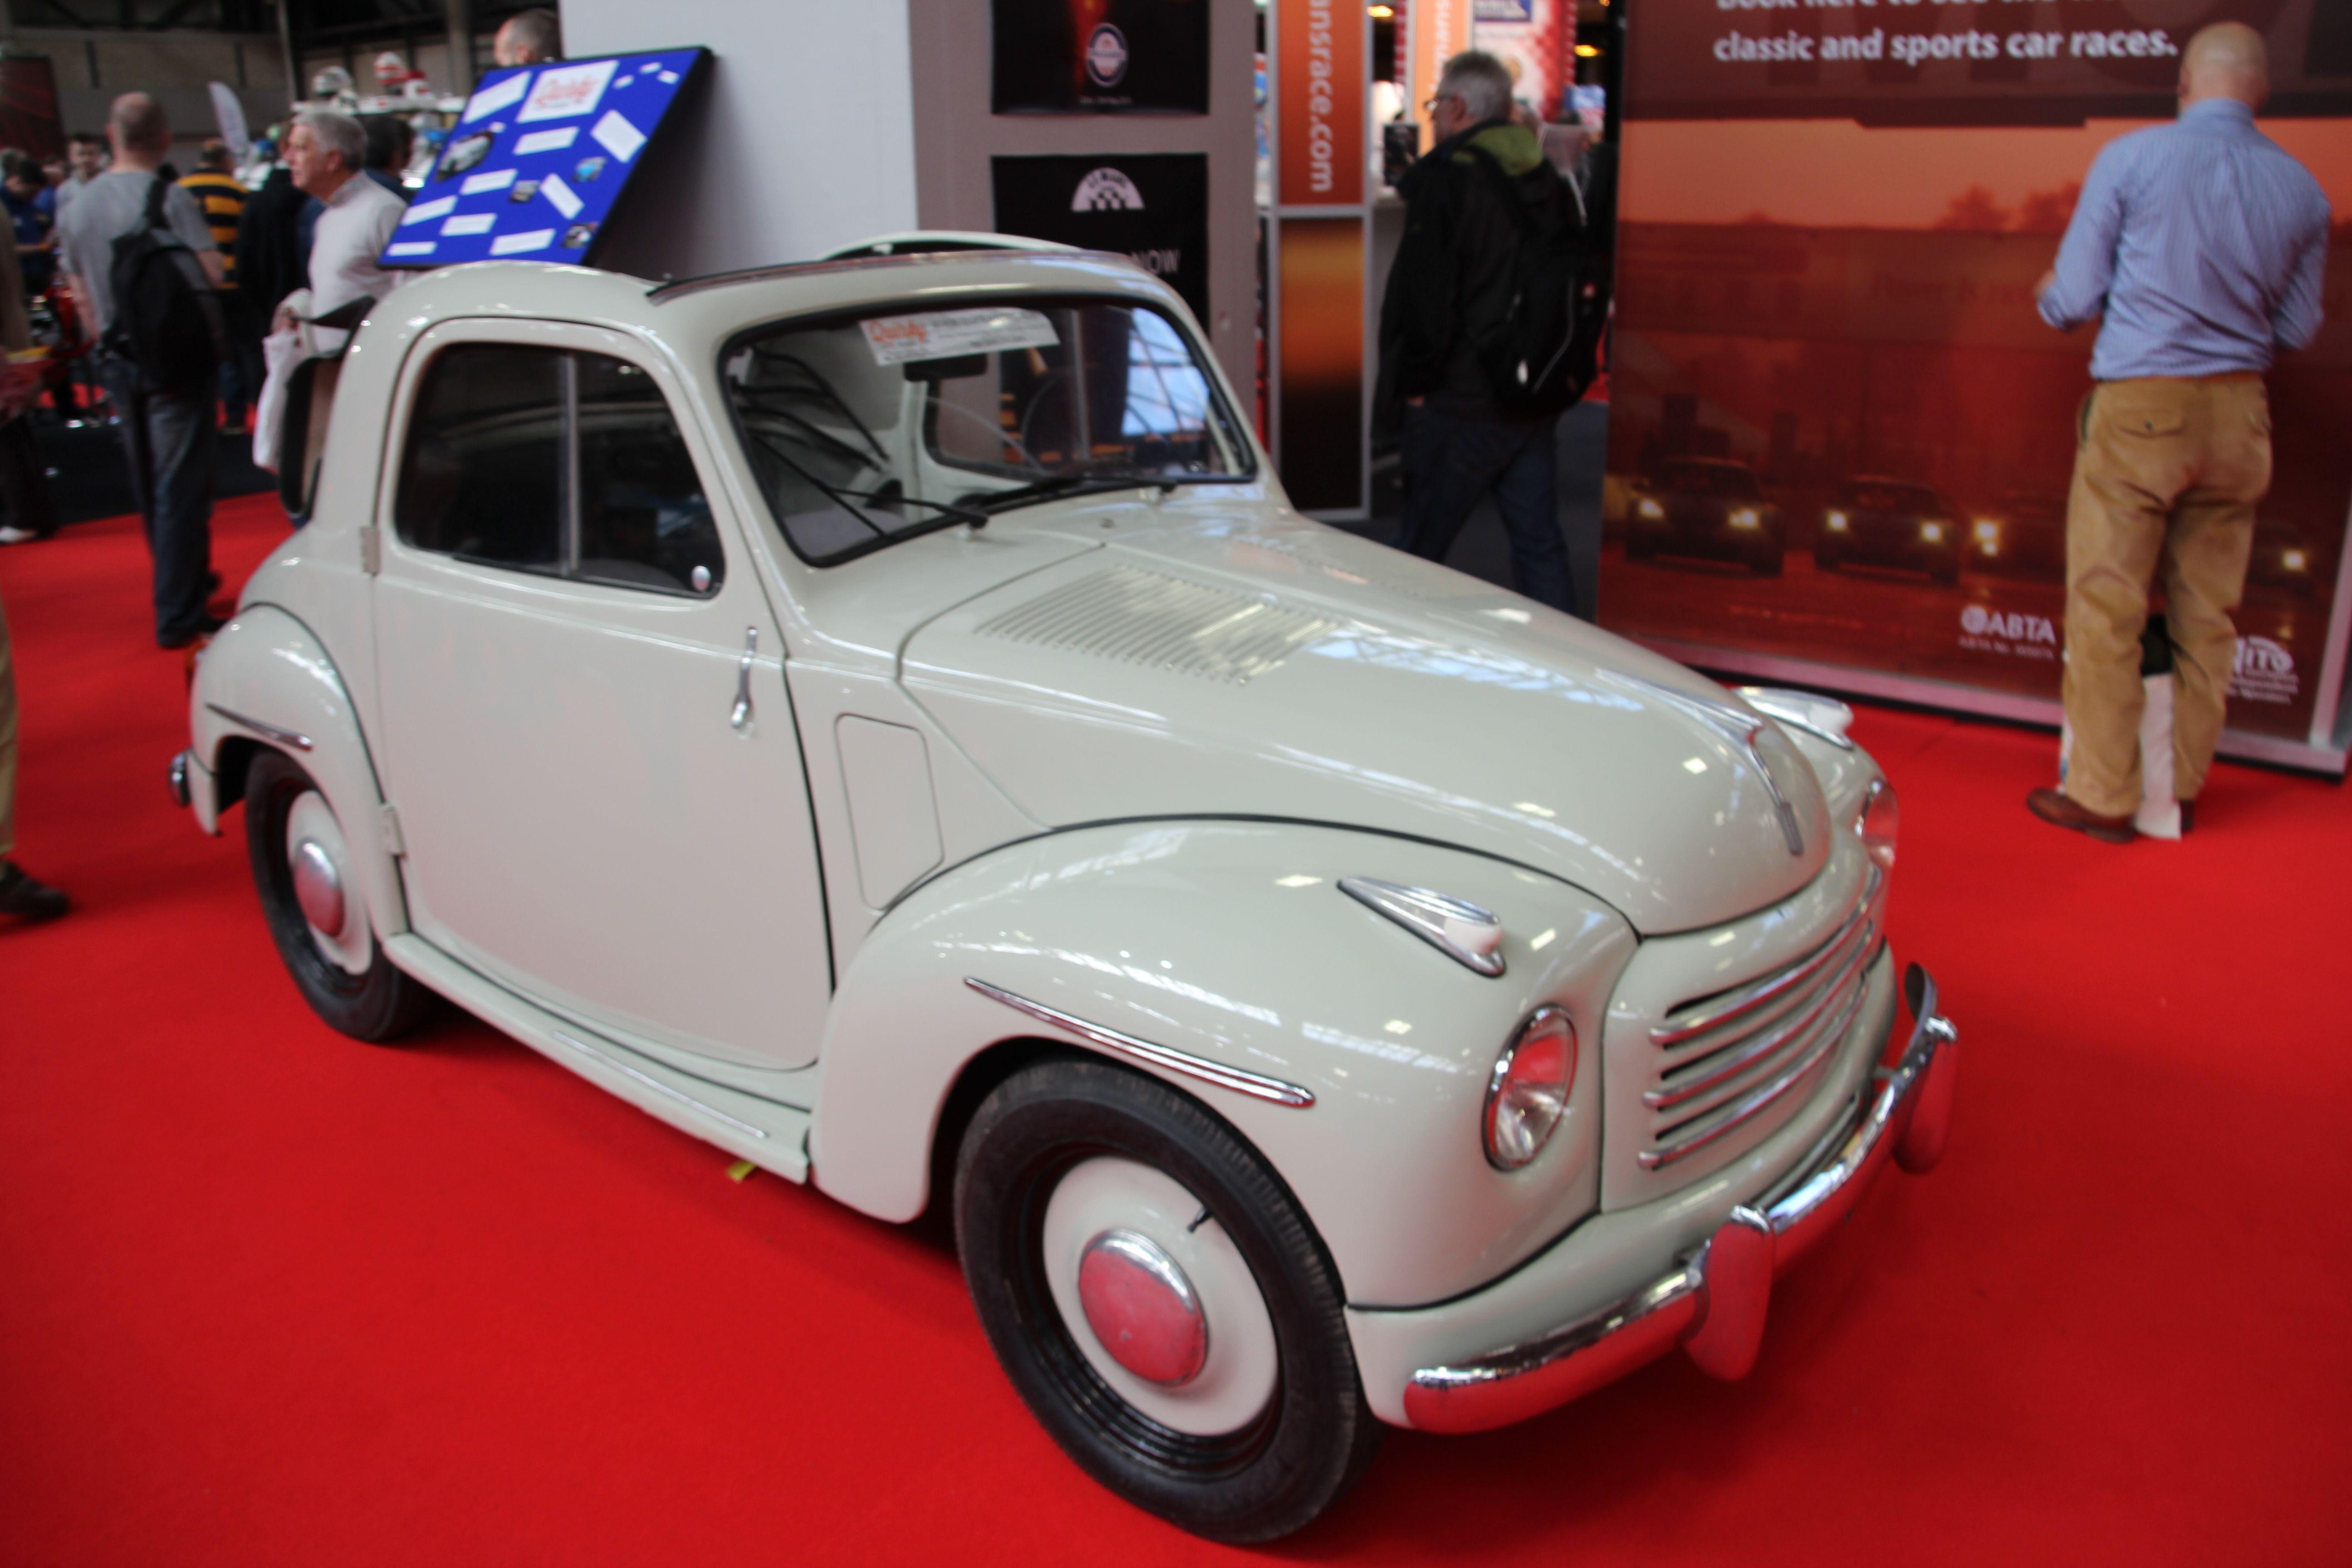 Quirky Rides Fiat Topolino C At The NEC Classic Car Show - Car show england